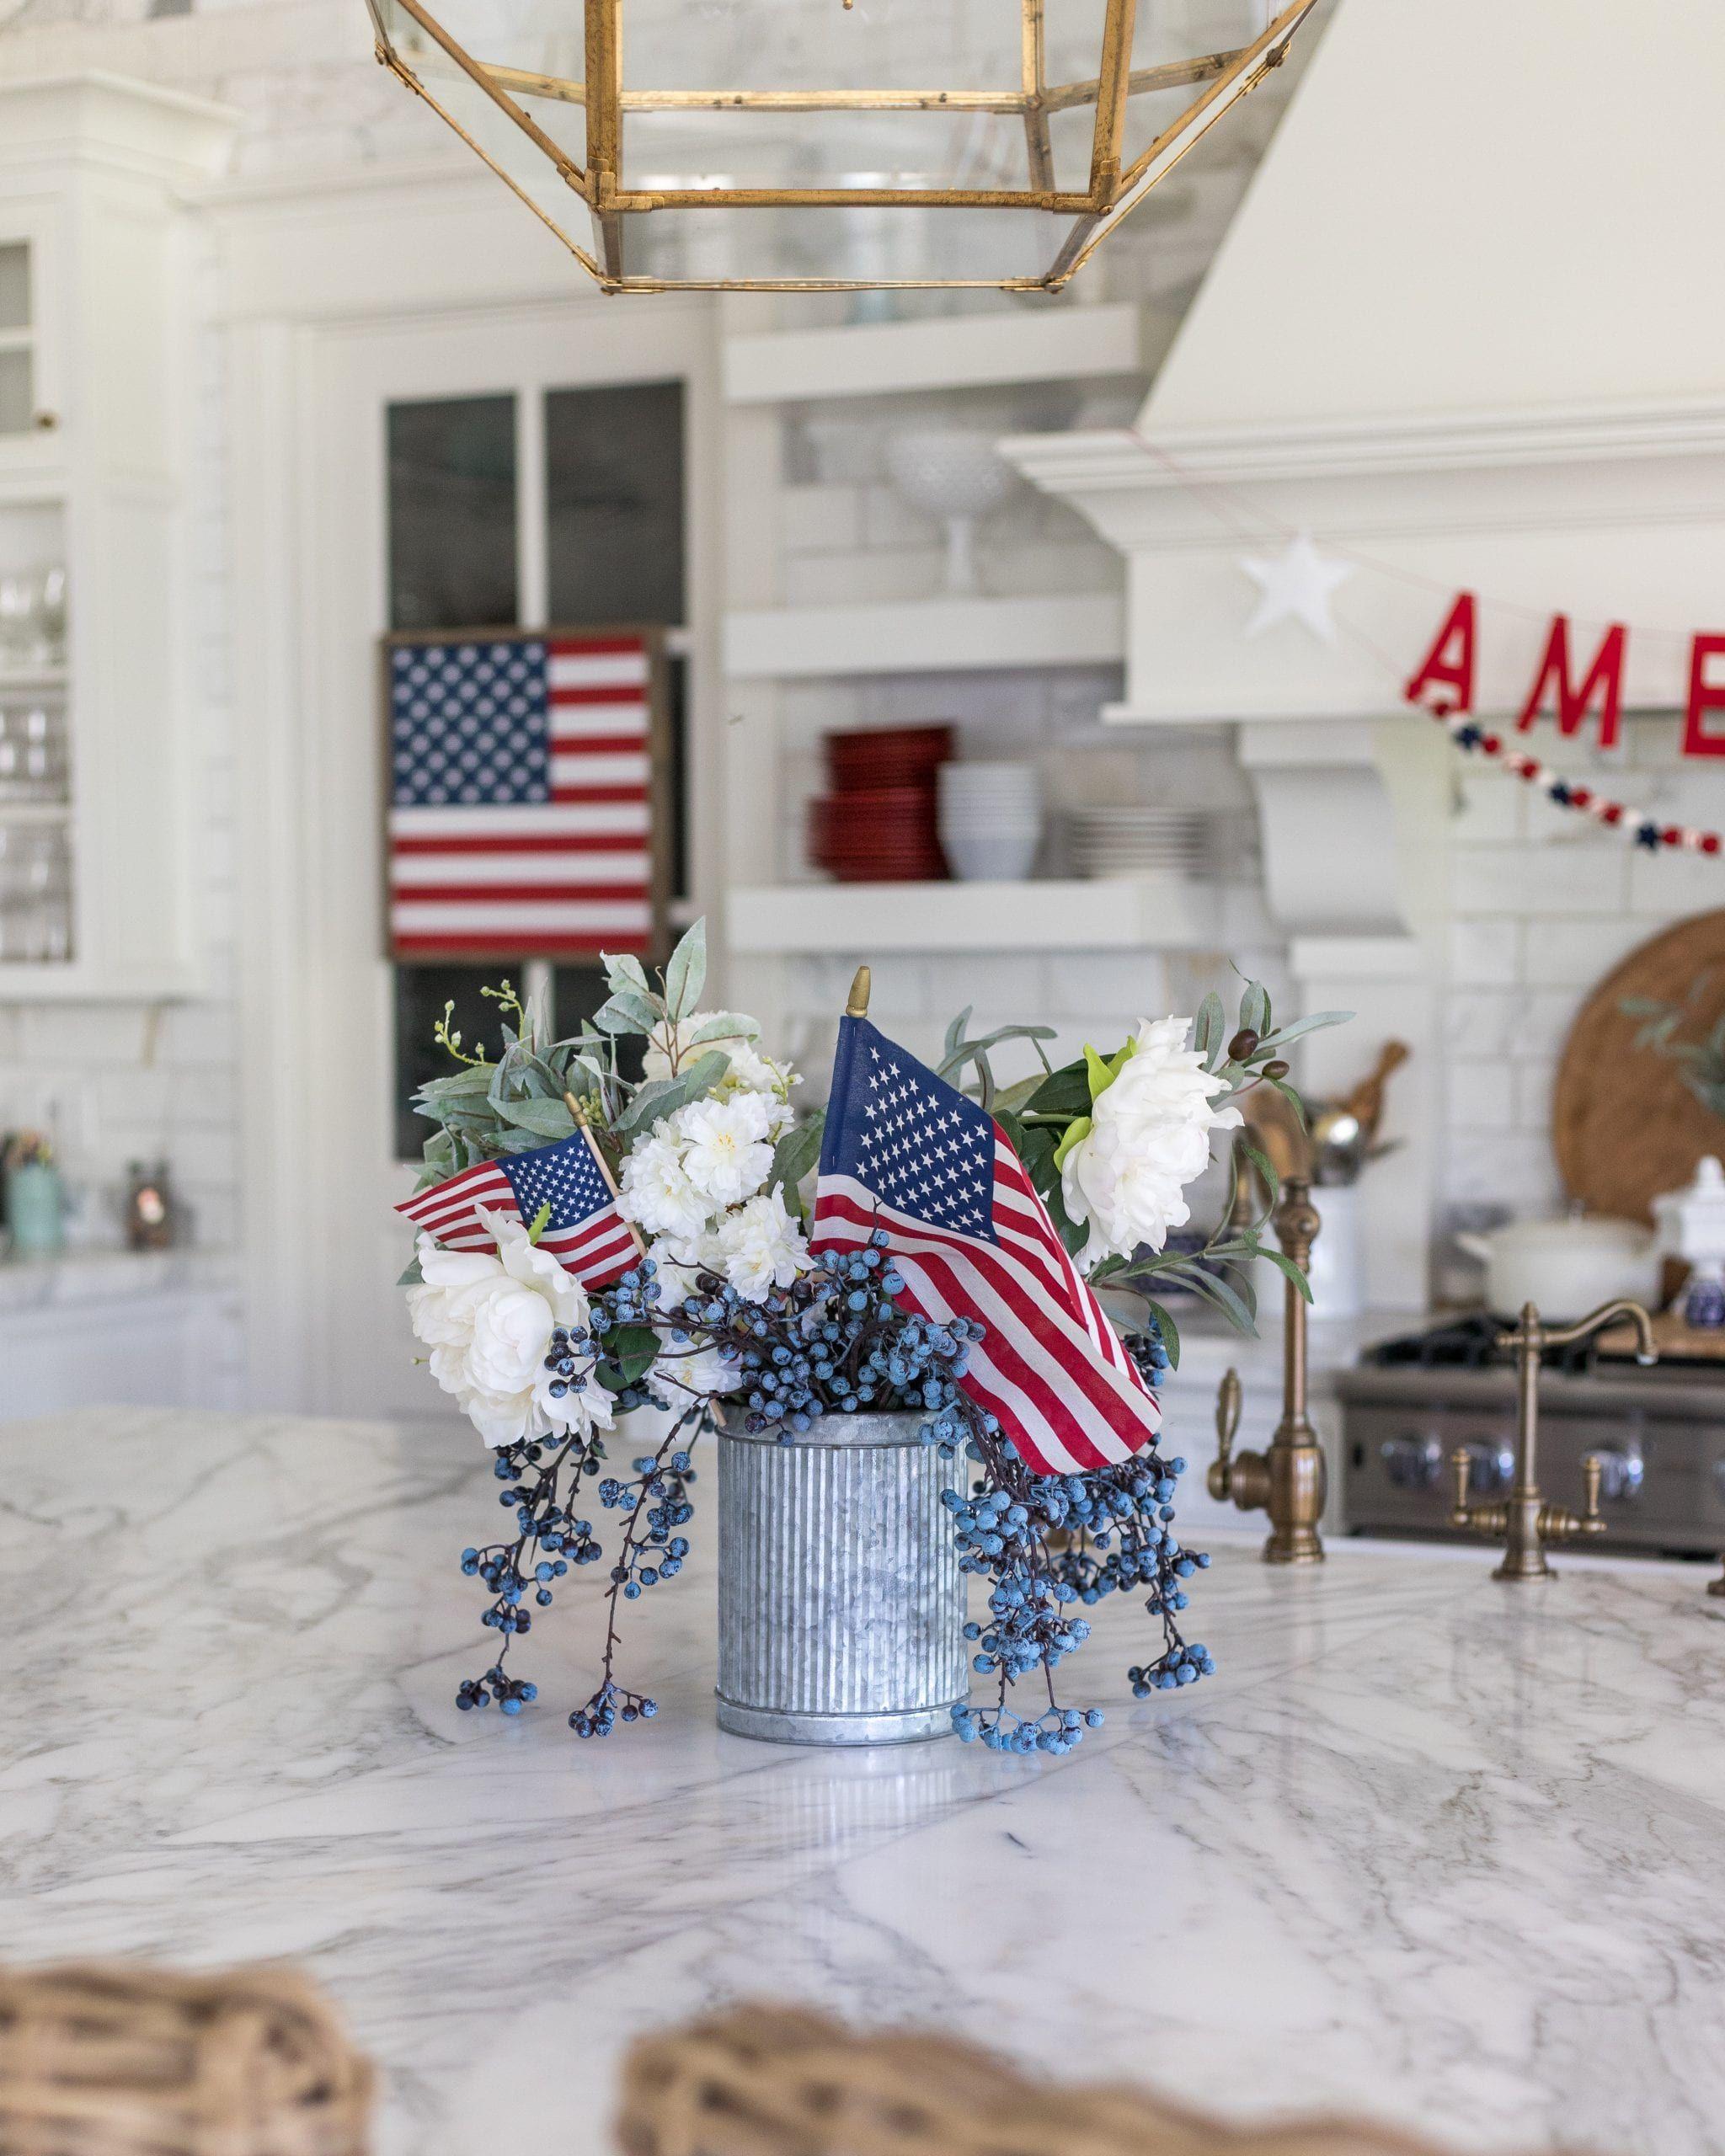 Pin On Patriotic Decorations